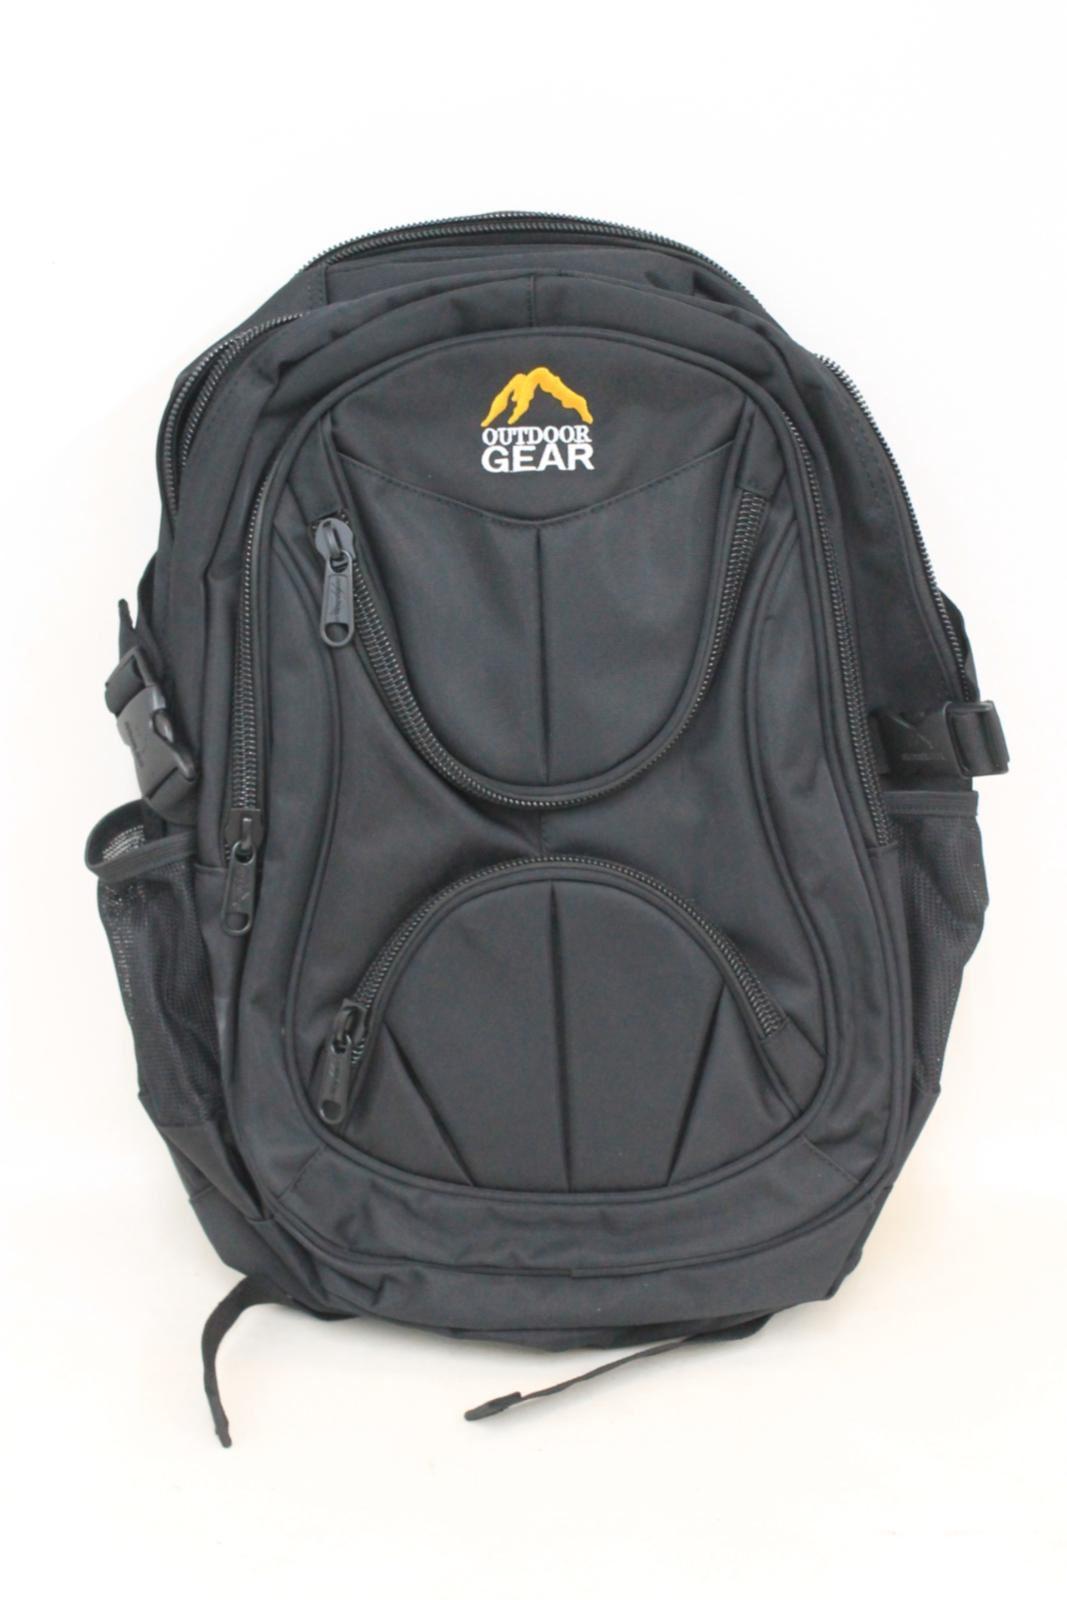 9a98cadc3f NEW OUTDOOR GEAR 6613 Men s Black Waterproof 35L Laptop Backpack Rucksack